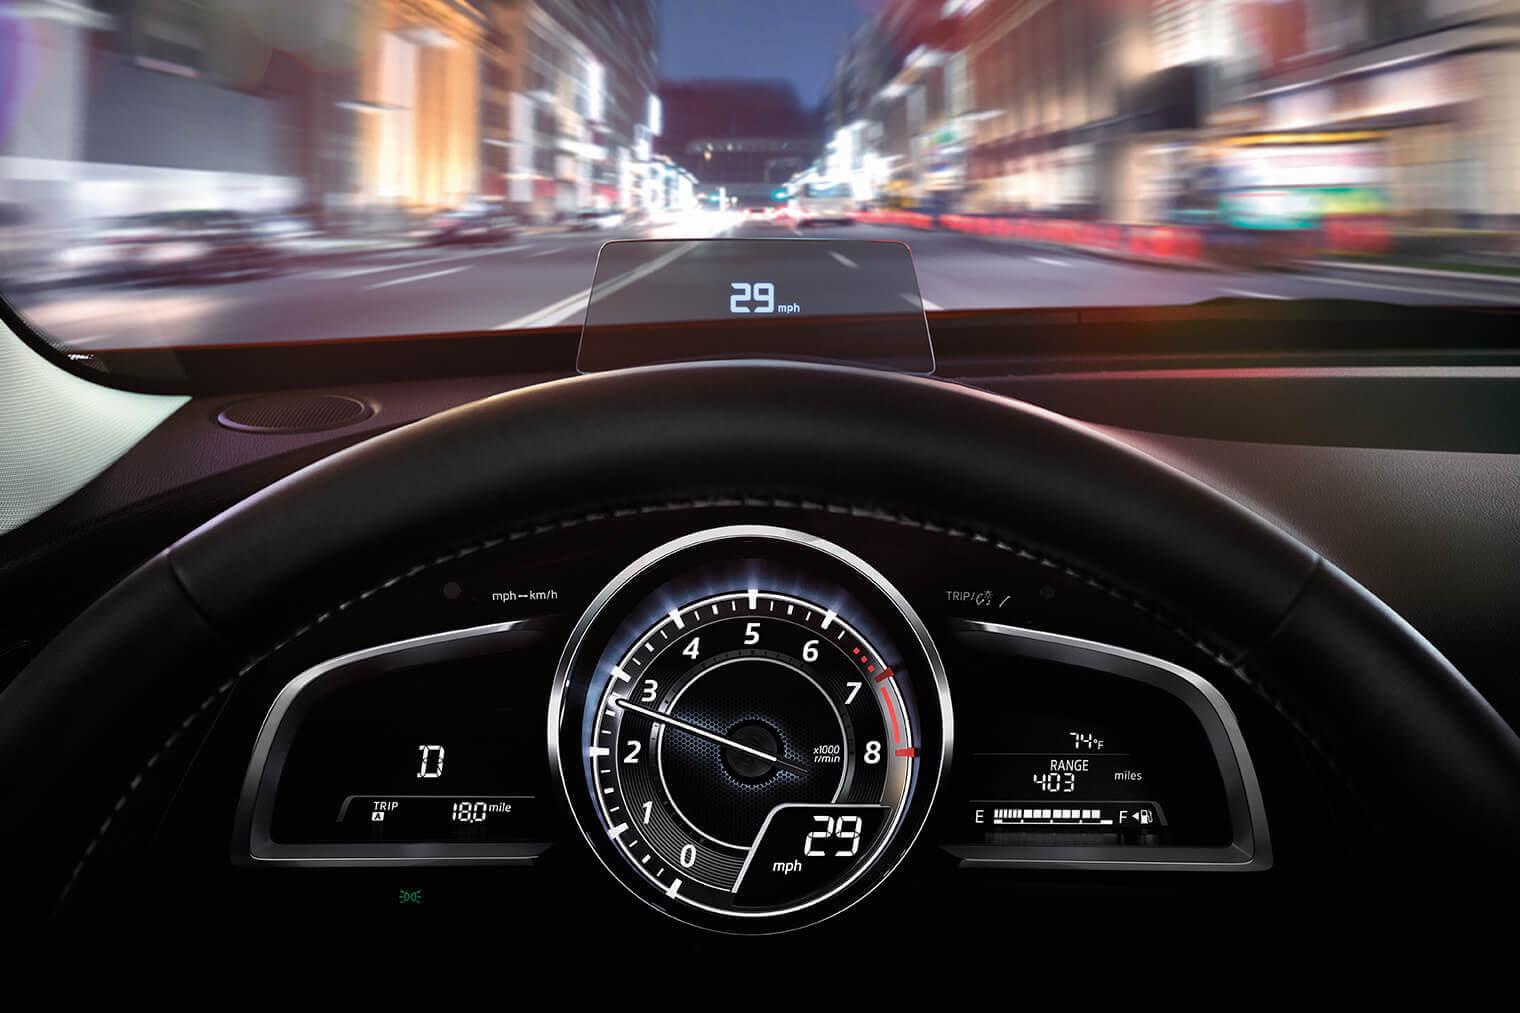 2017 Mazda CX-3 display